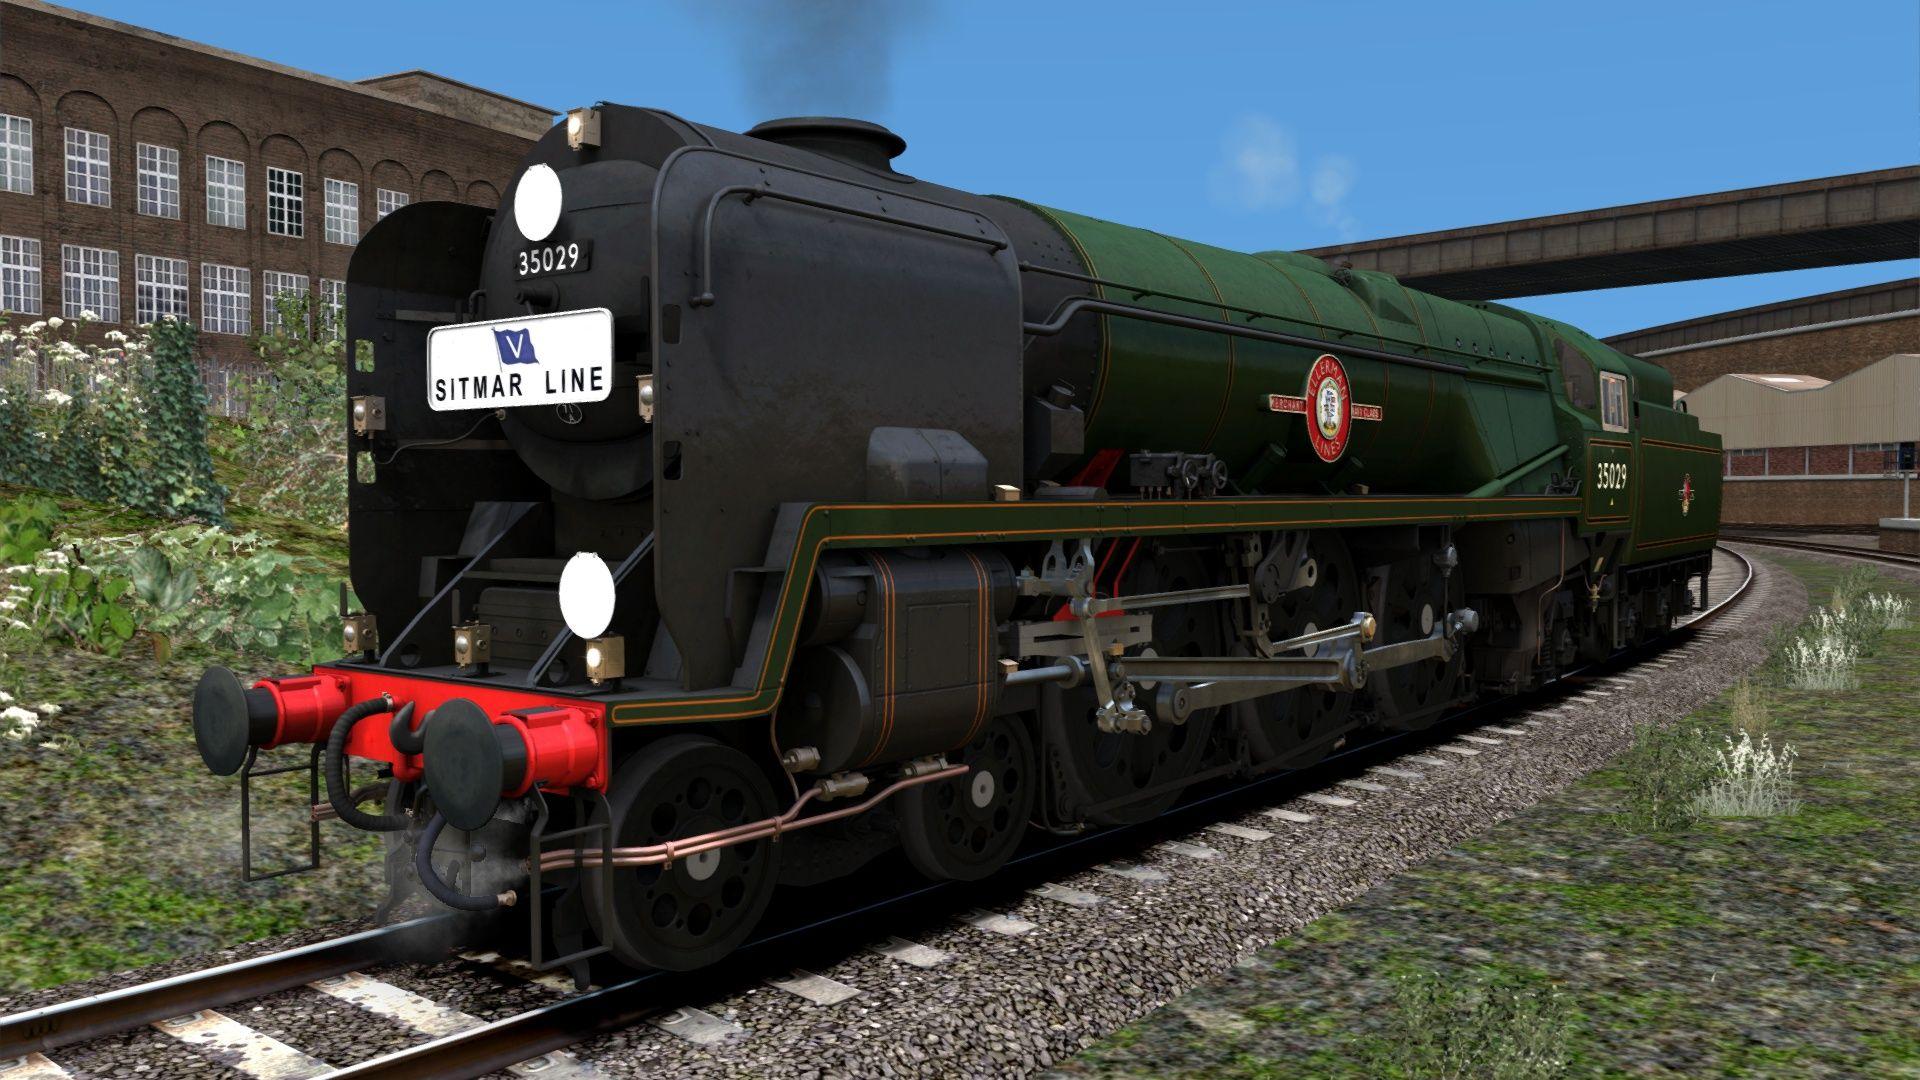 Screenshot_Chatham Main & Medway Valley Lines_51.47478--0.14353_14-05-35.jpg